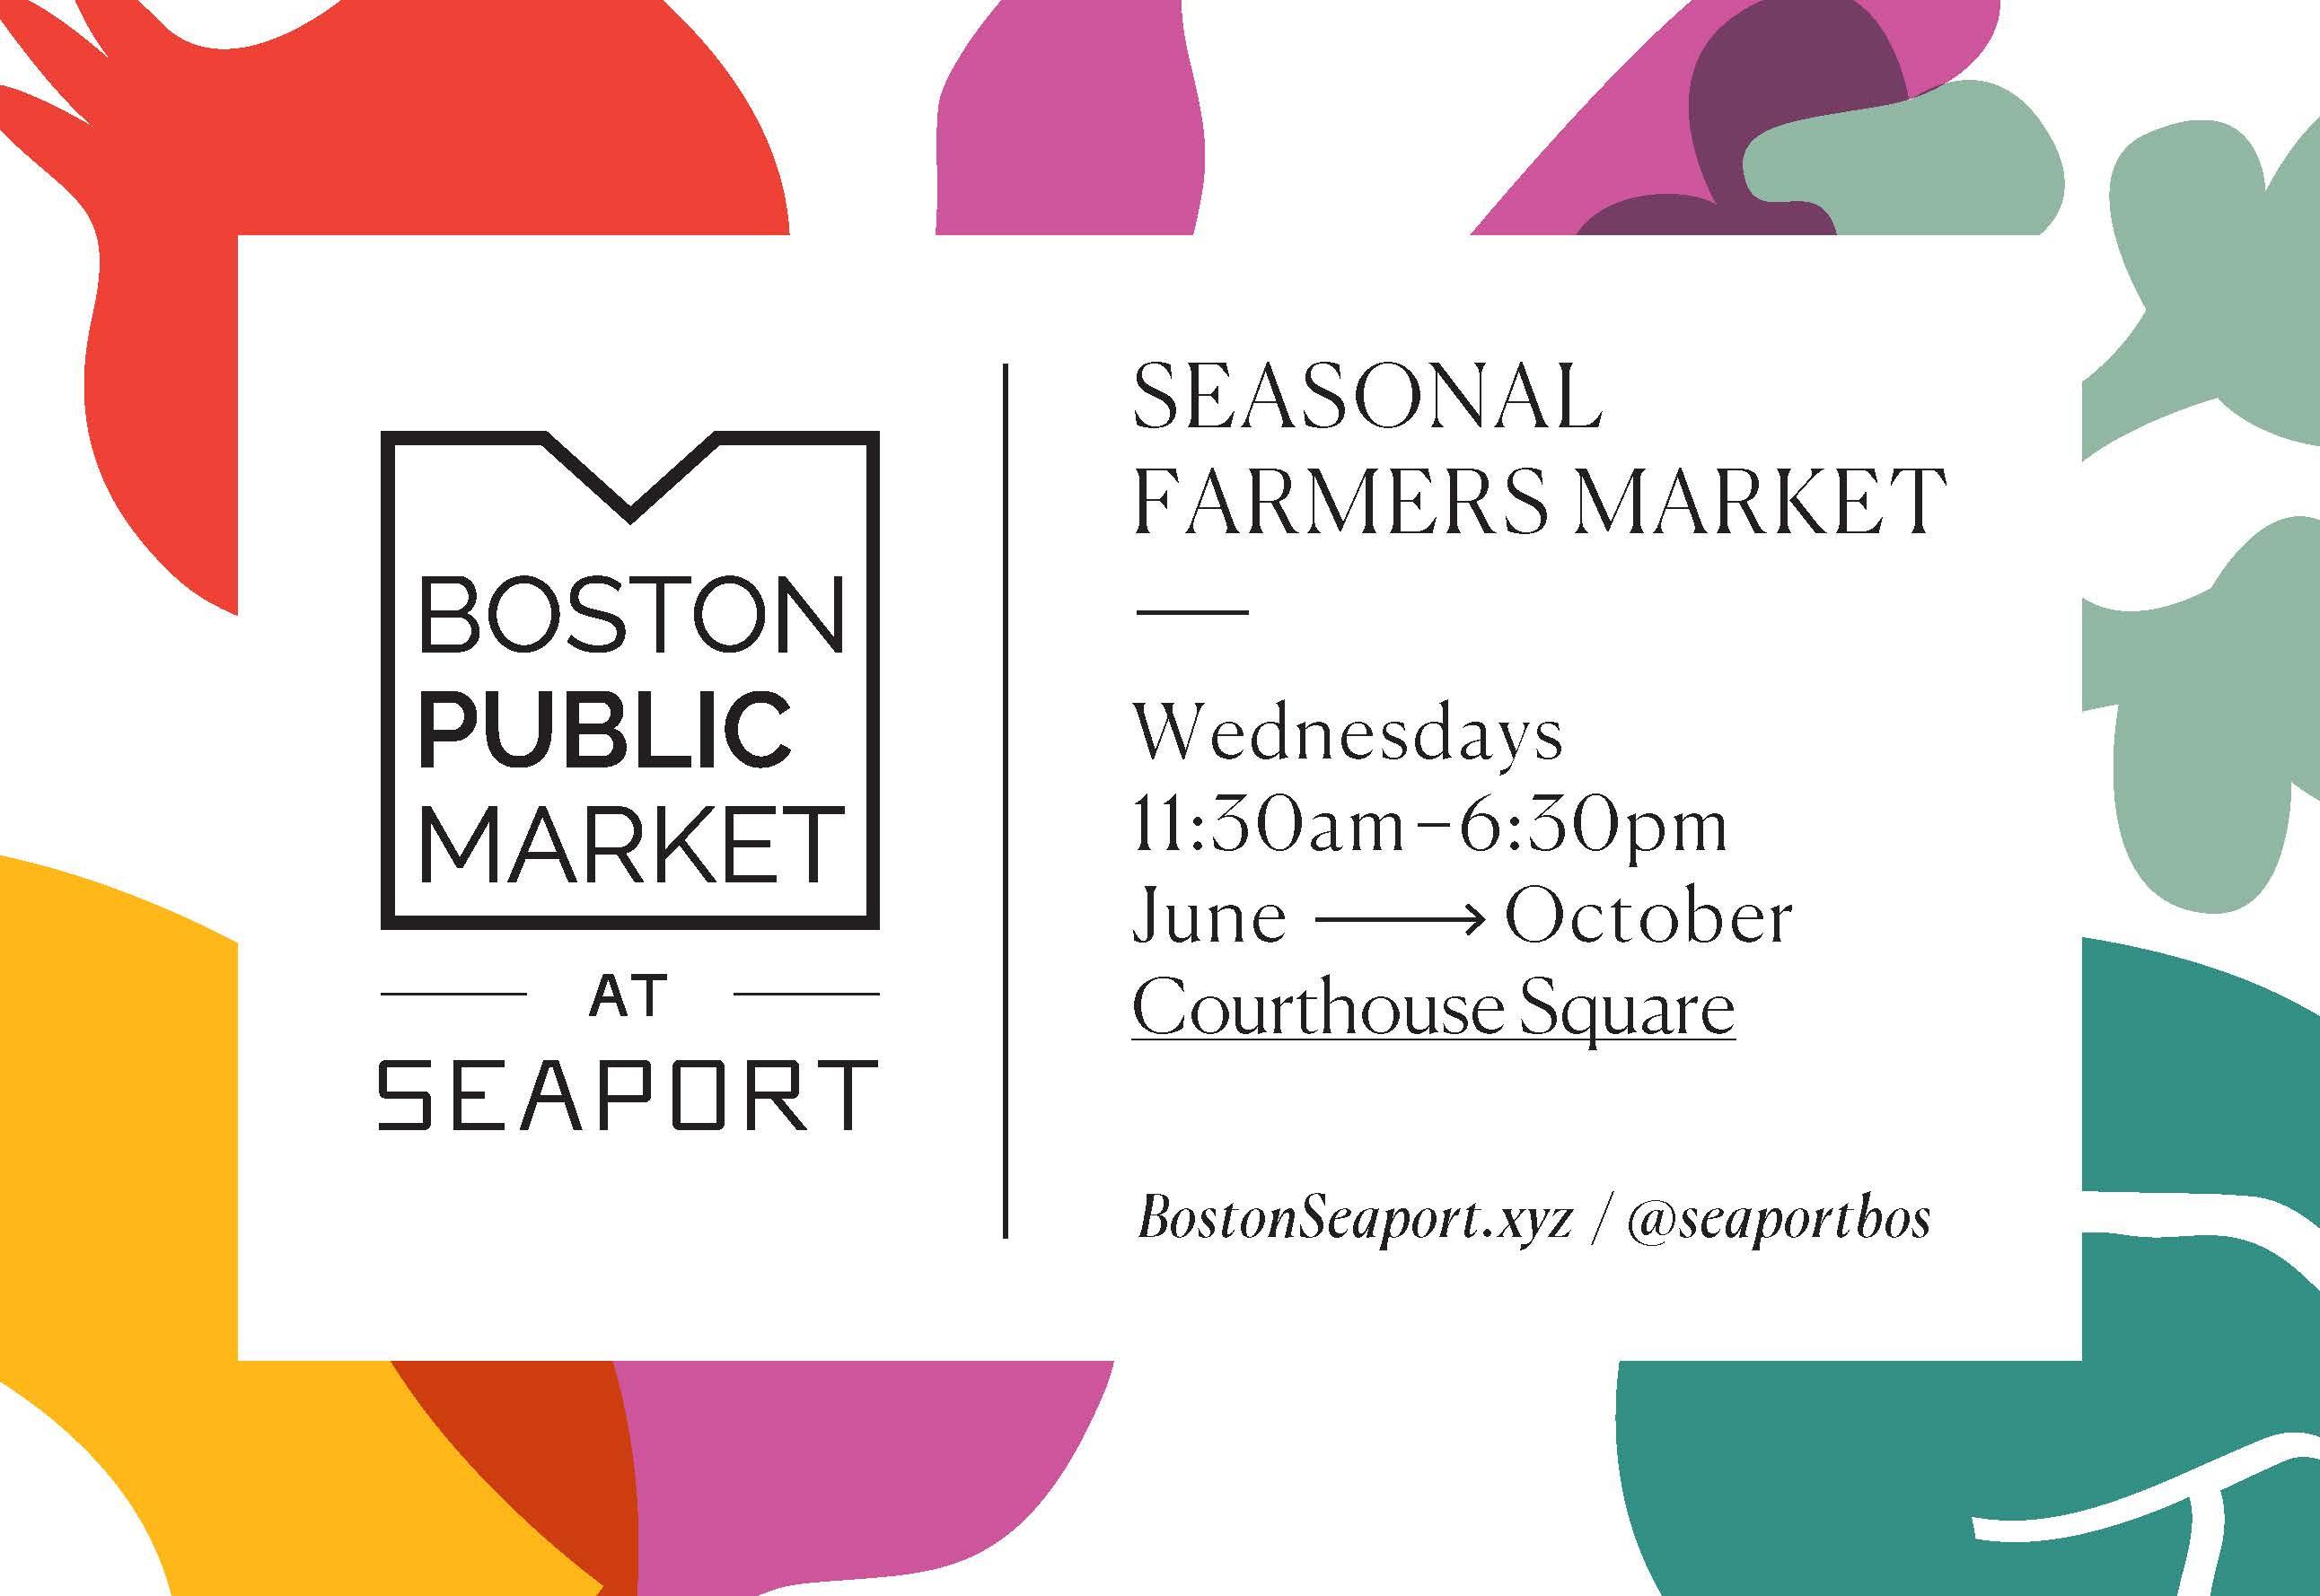 Boston Public Market at Seaport